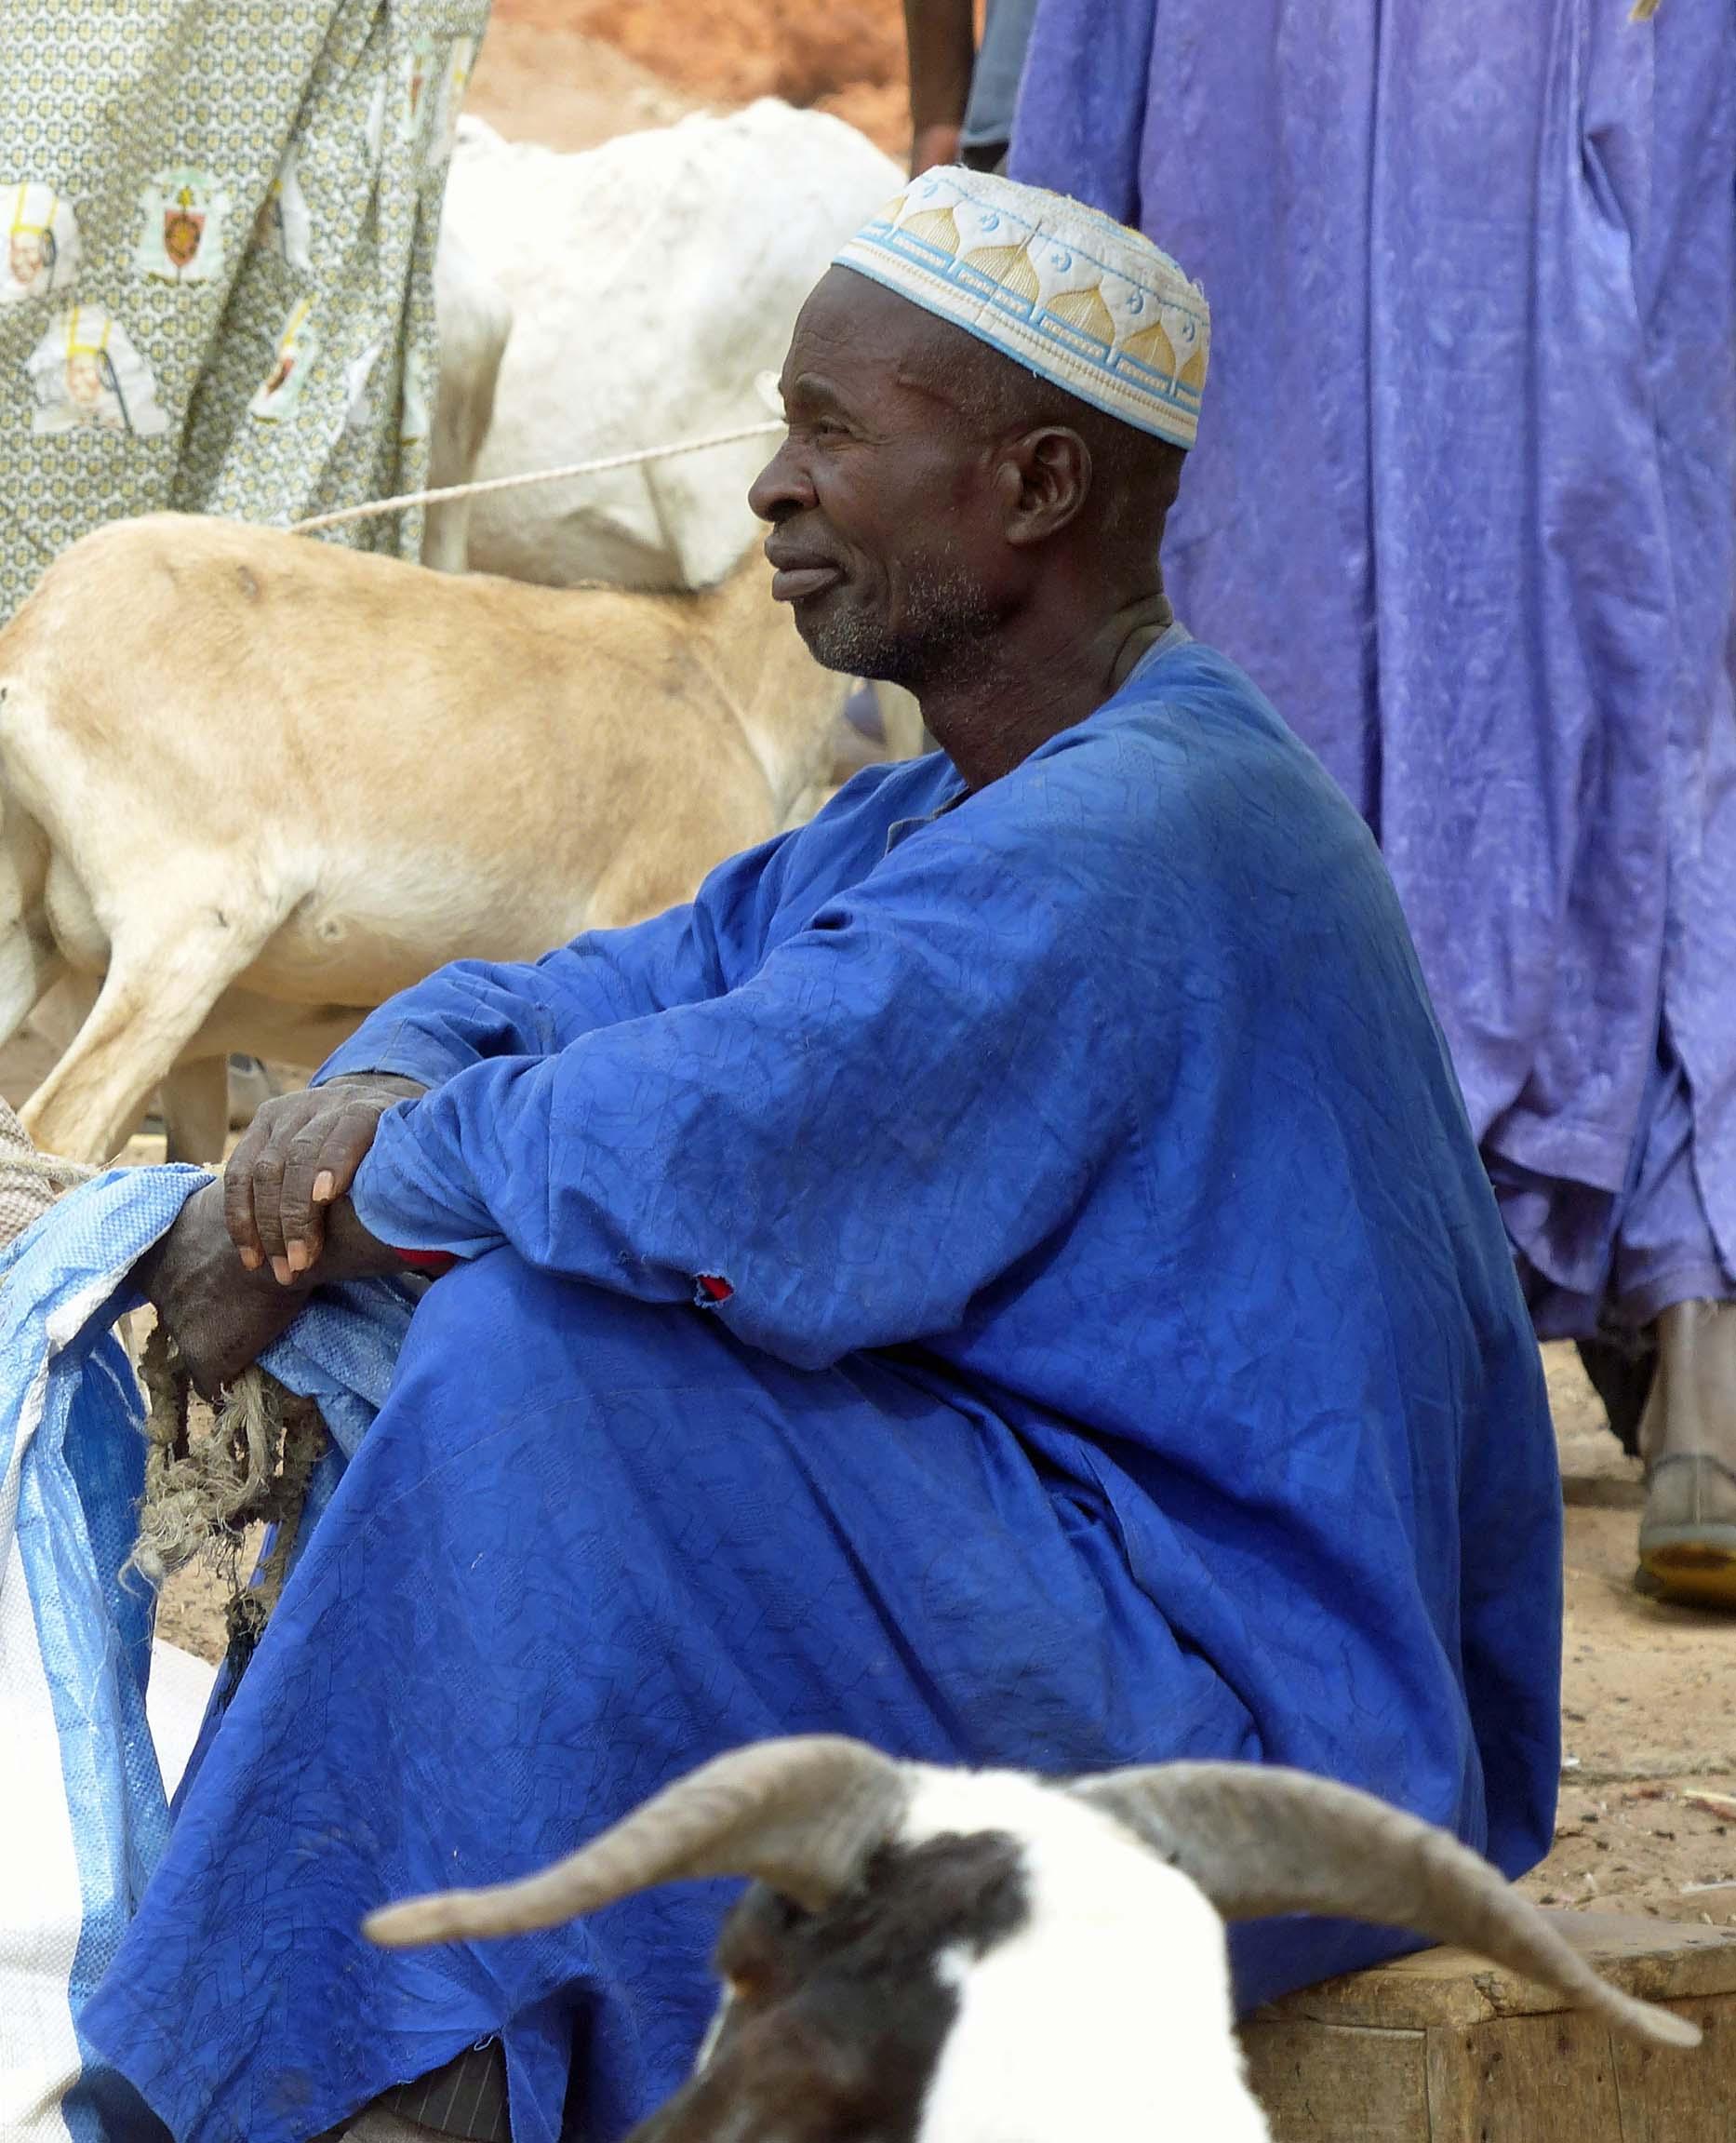 Man in blue African dress